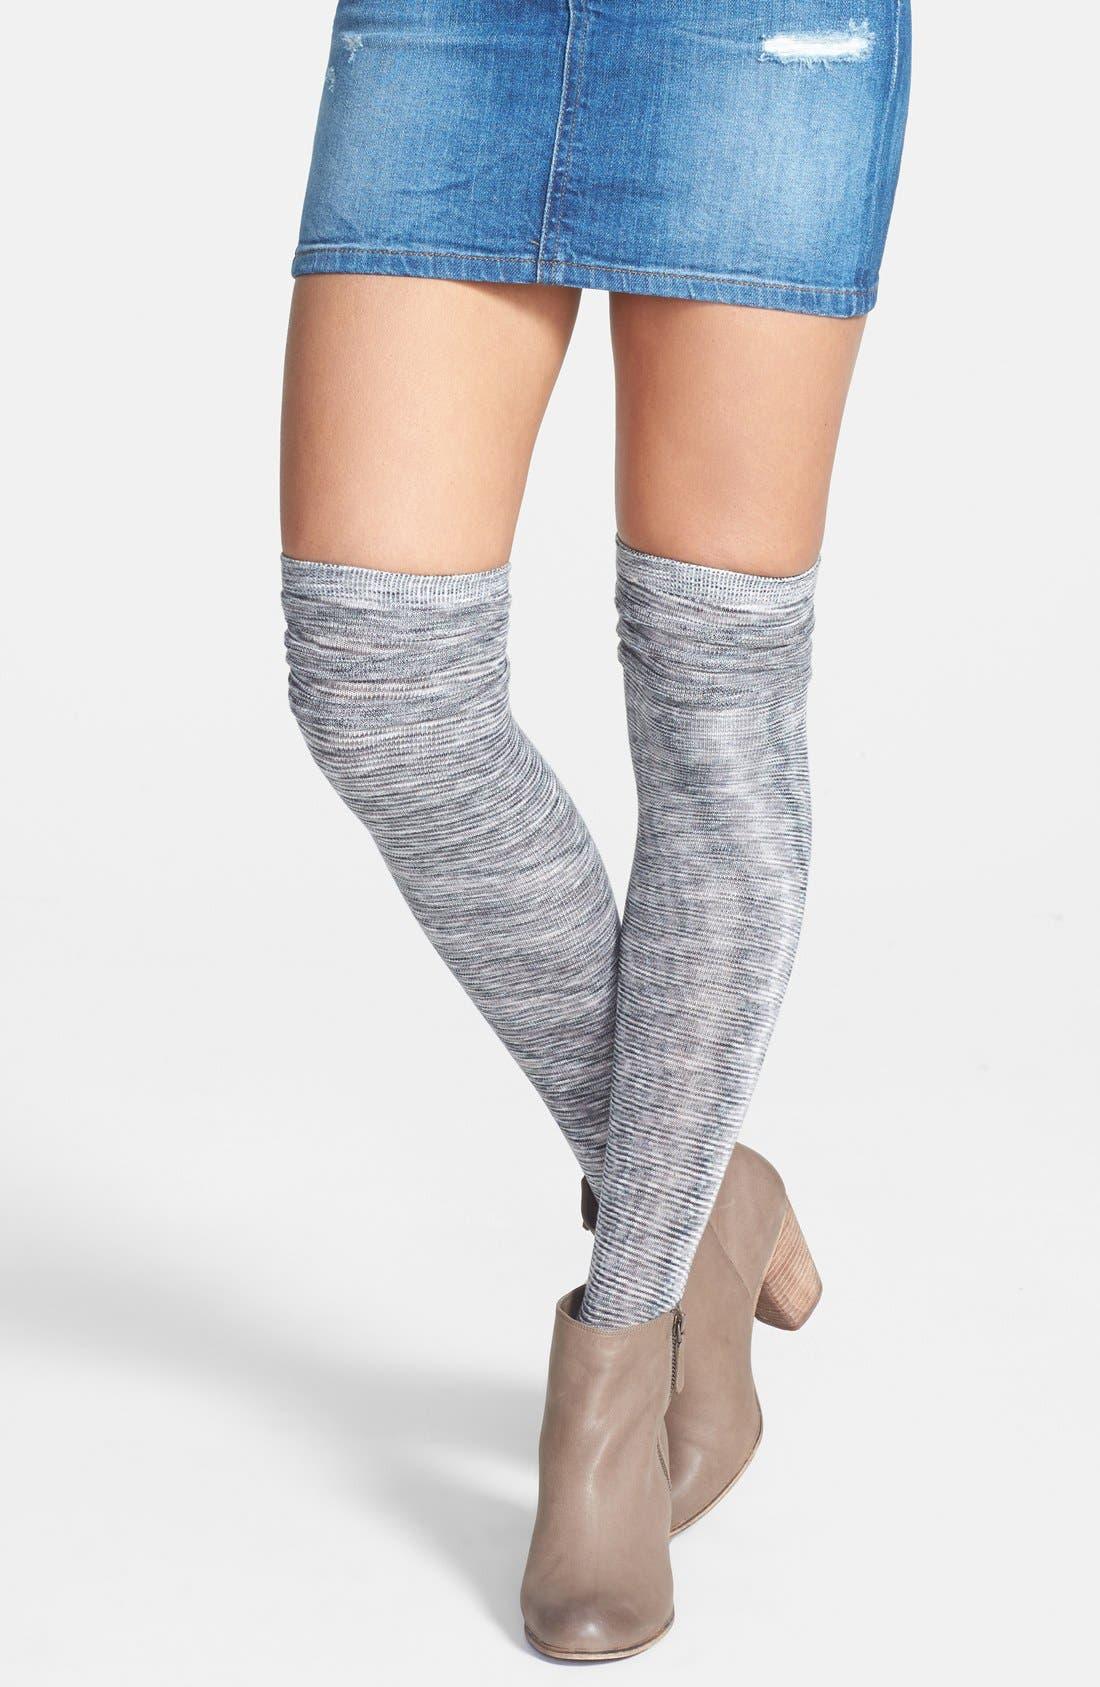 Main Image - K. Bell Socks Triple Ruffle Space Dye Over the Knee Socks